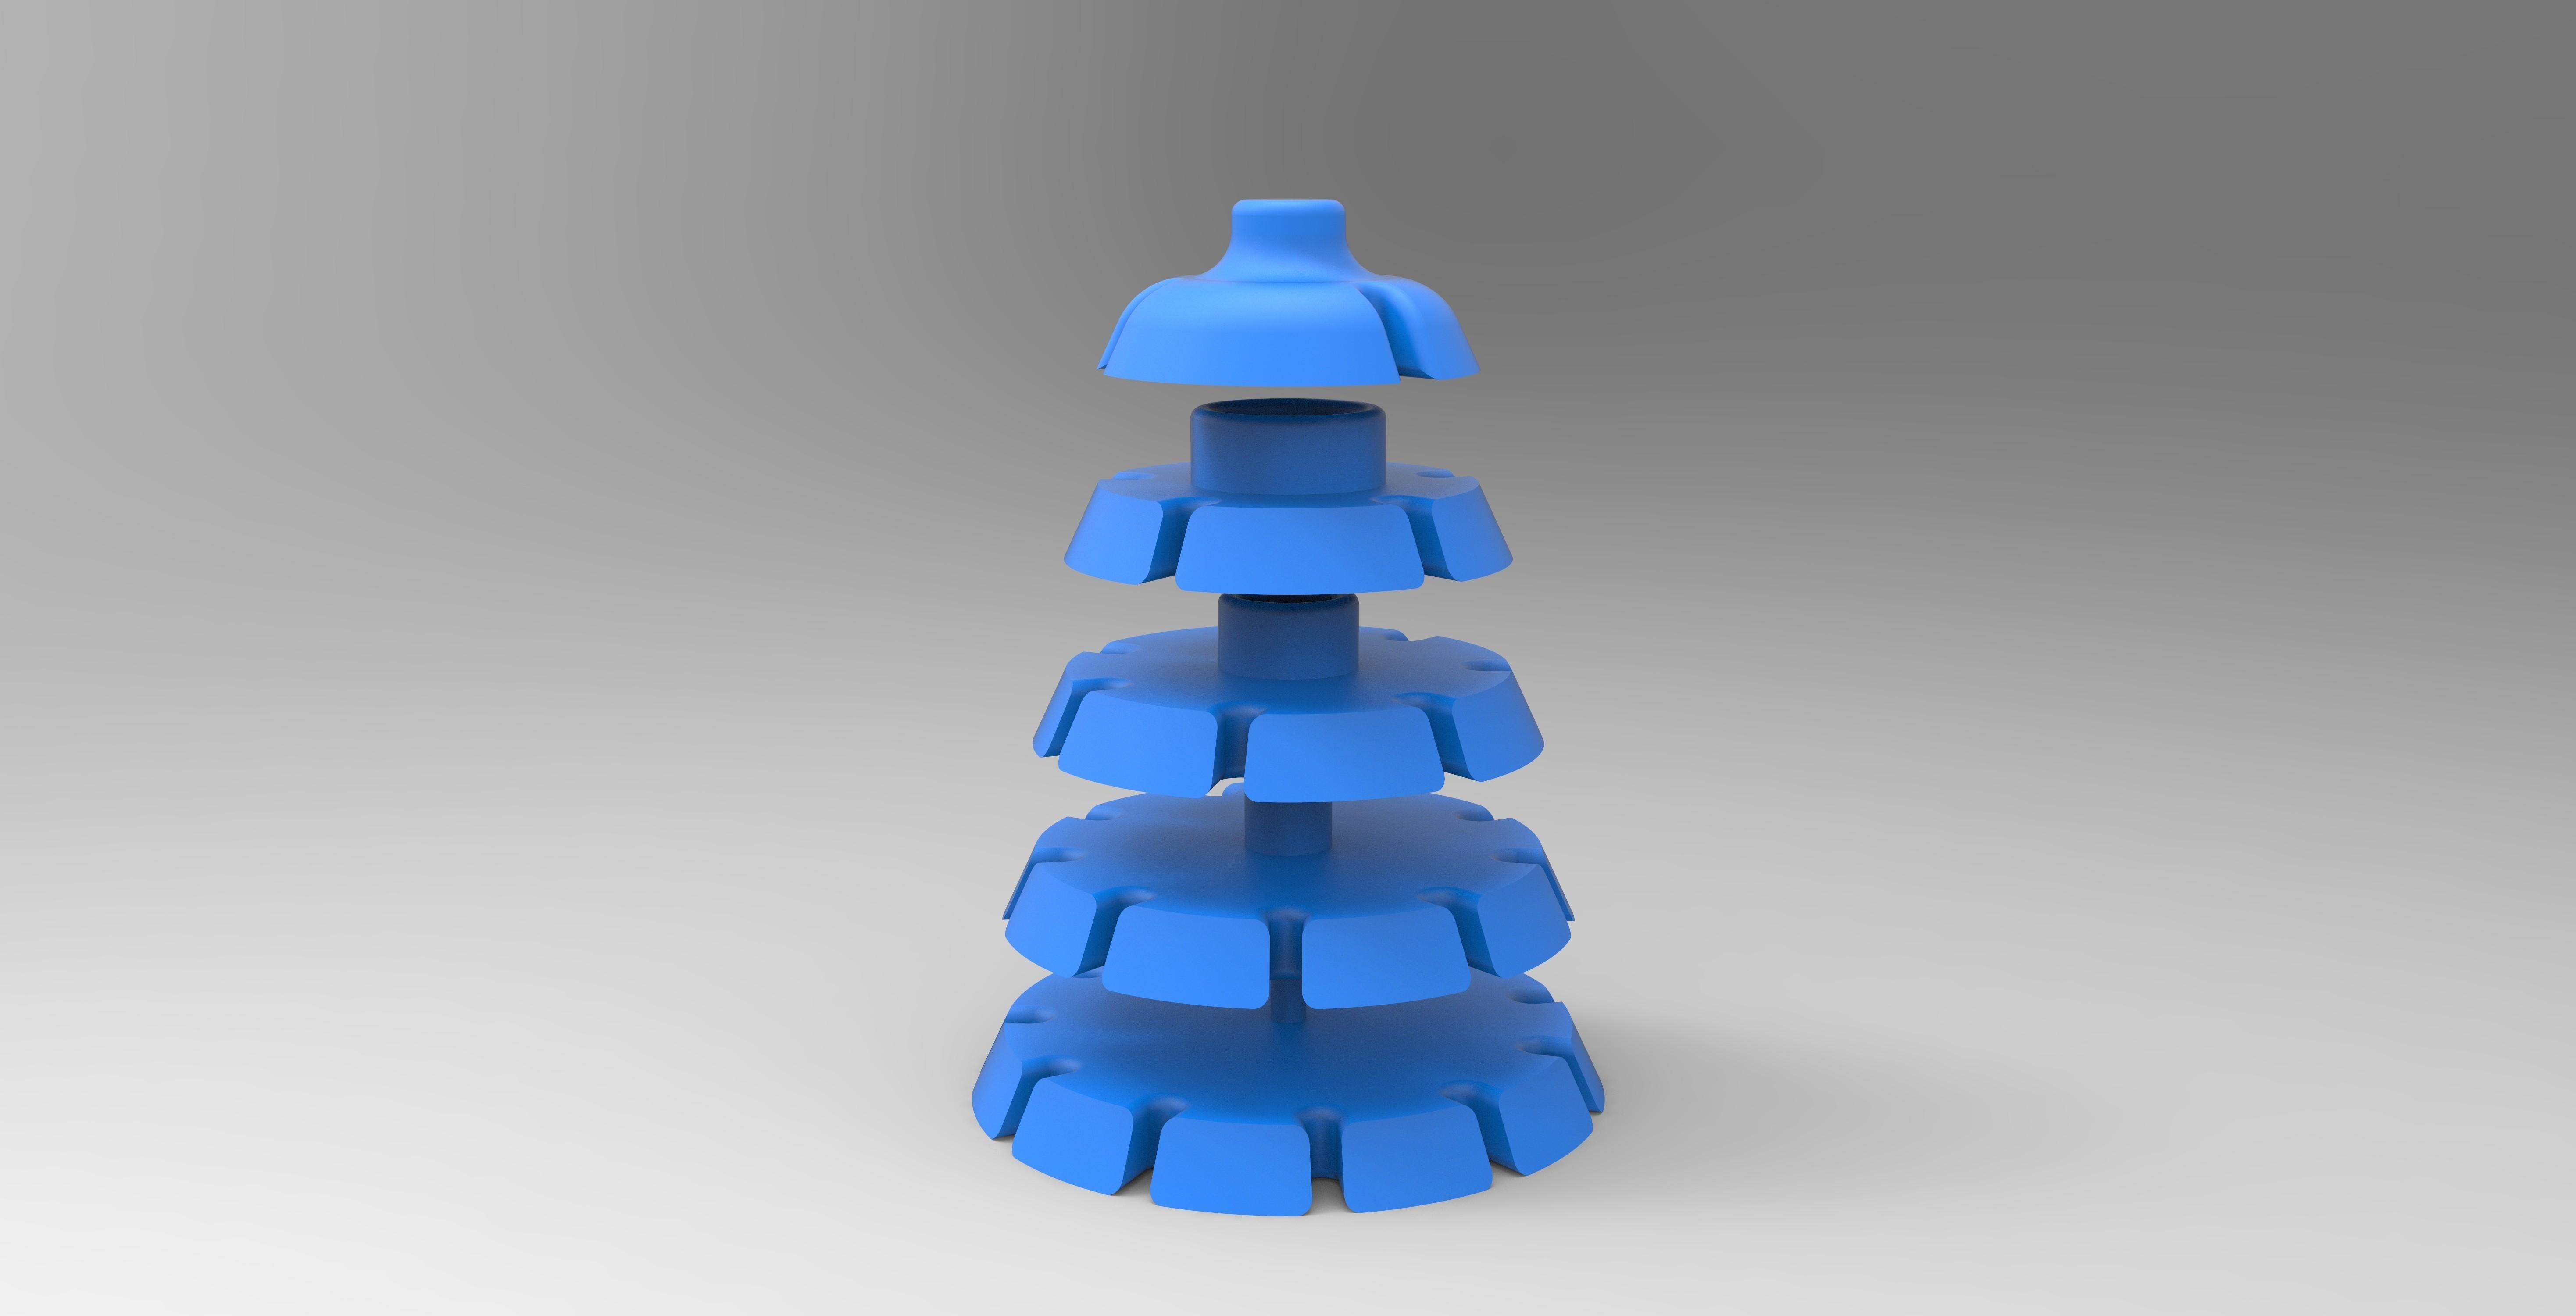 s.jpg Download STL file HELP CUTTING CAKE PART CUTTING • 3D printer object, GuilhemPerroud